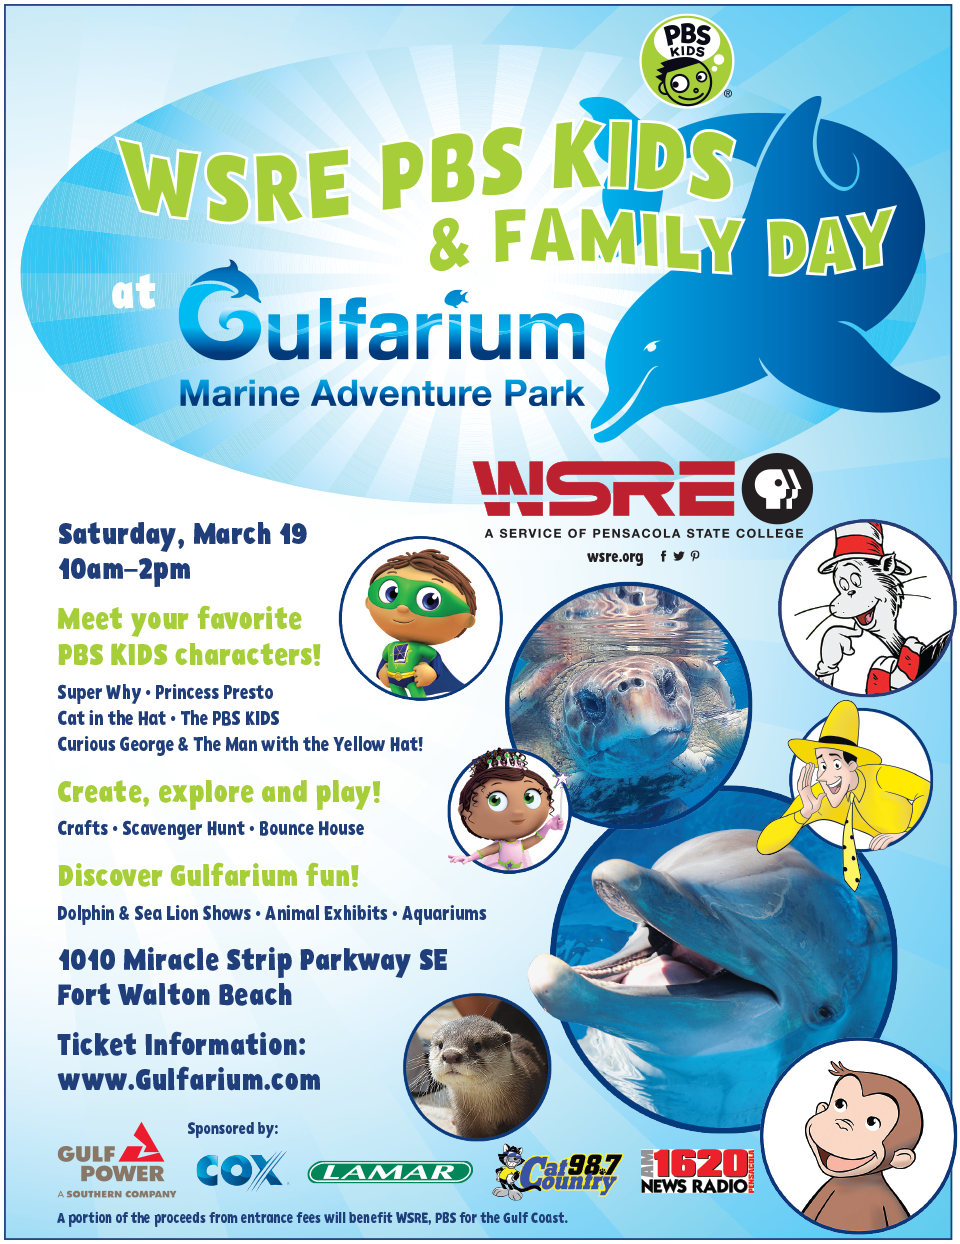 16018-0216 Gulfarium PBS Kids day flyer.png